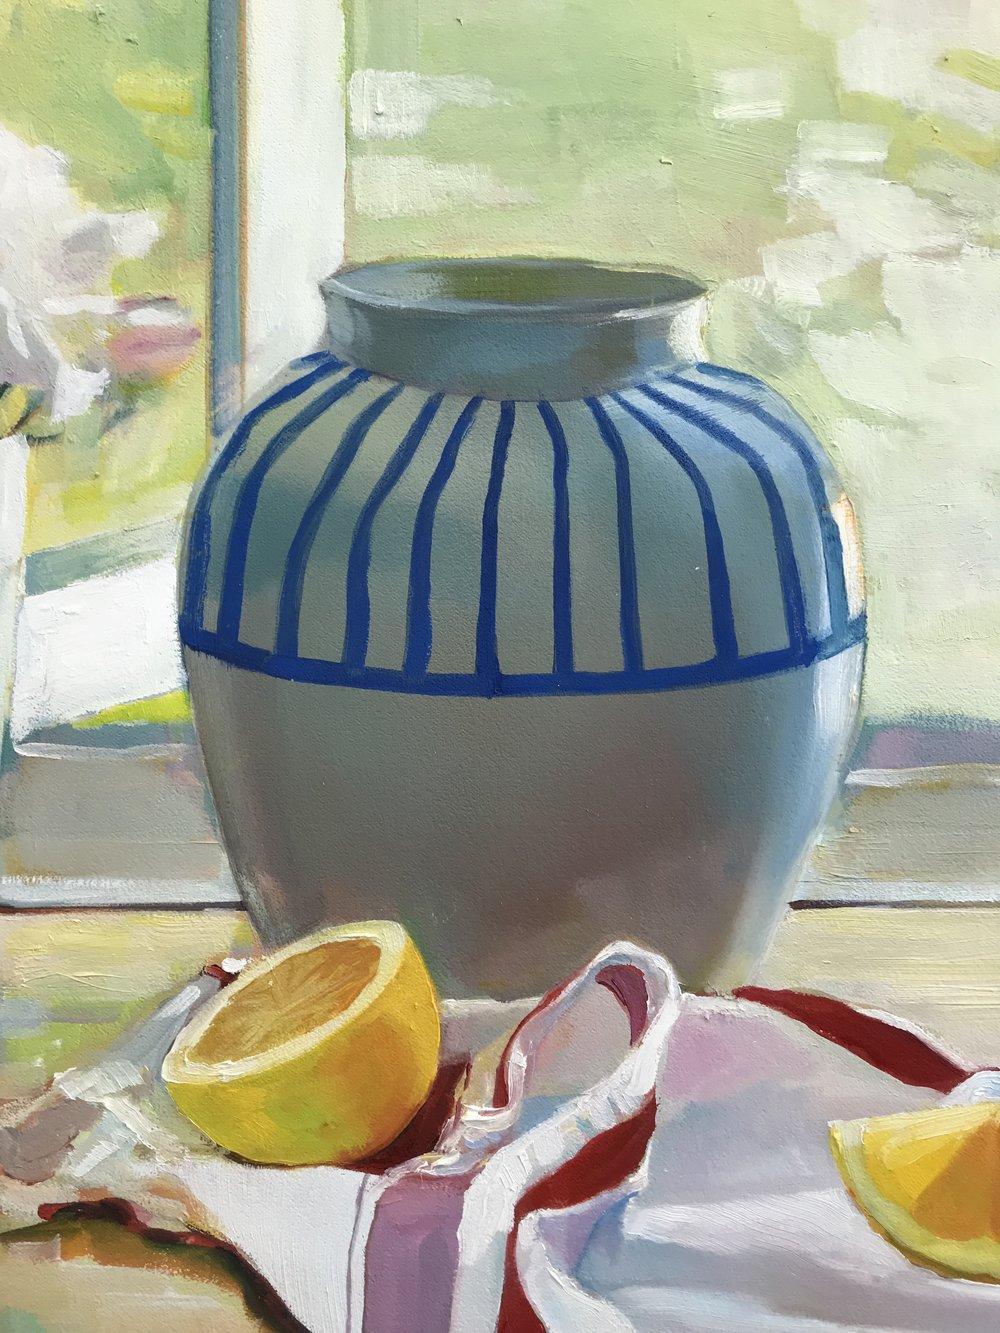 painted vase detail.jpeg